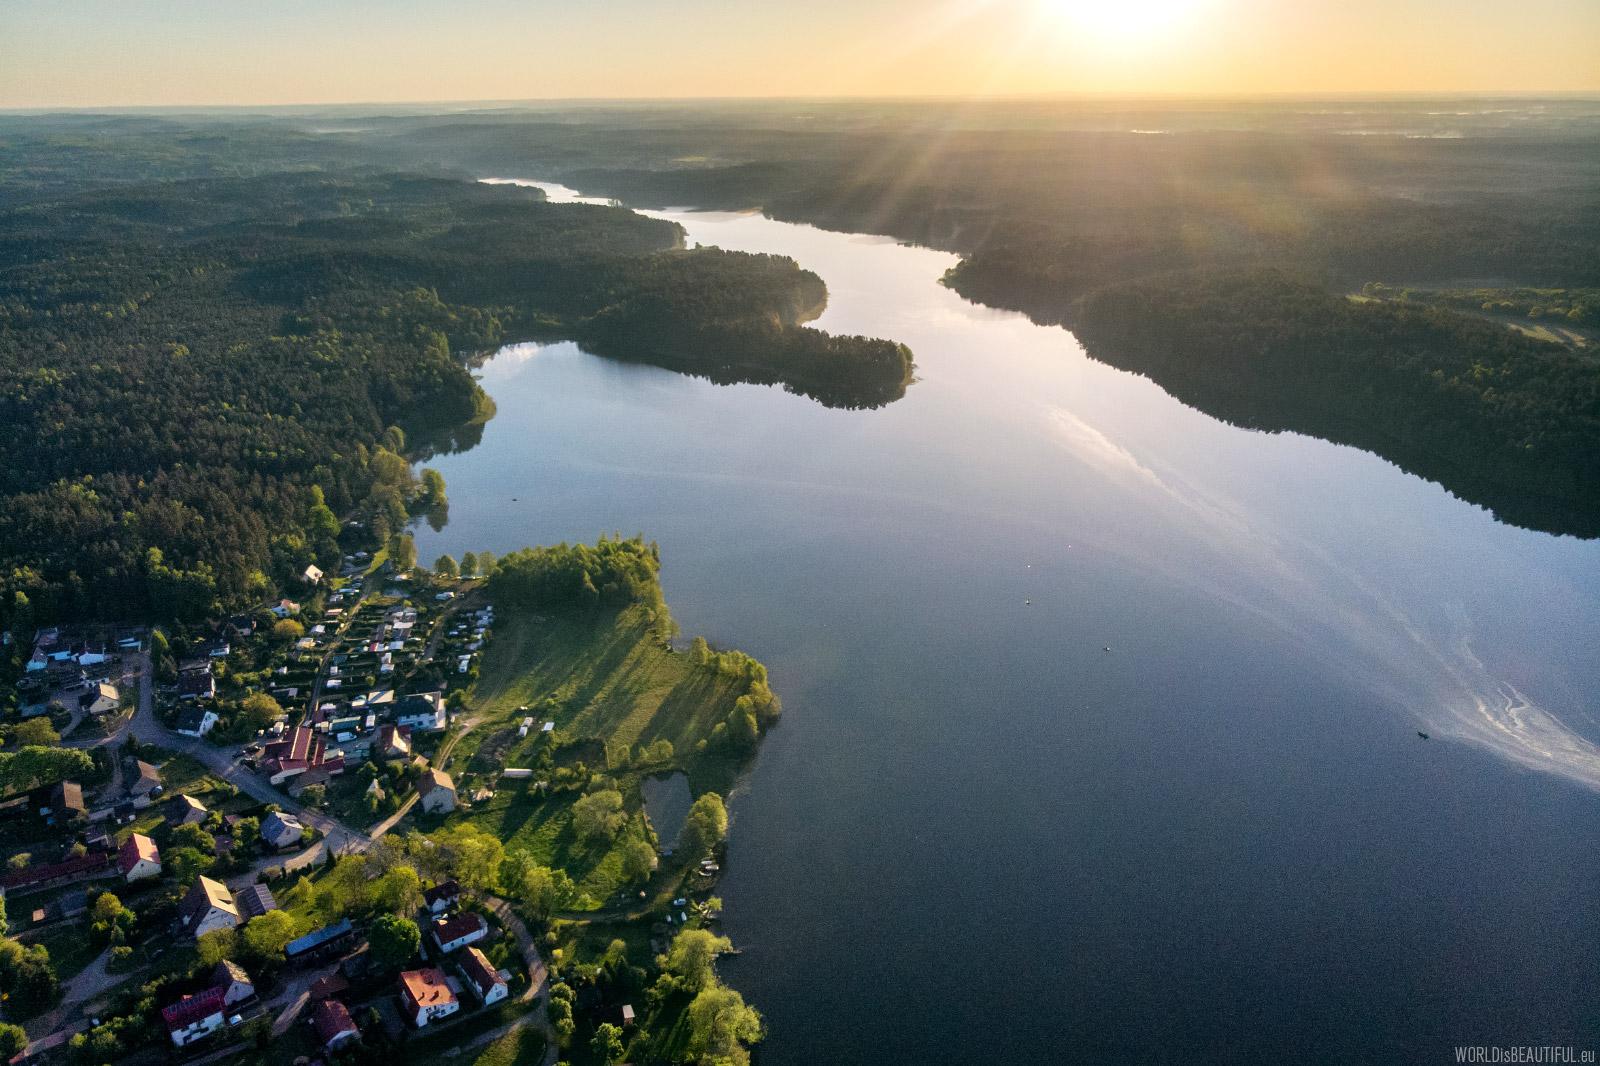 Kłączno - lake and village